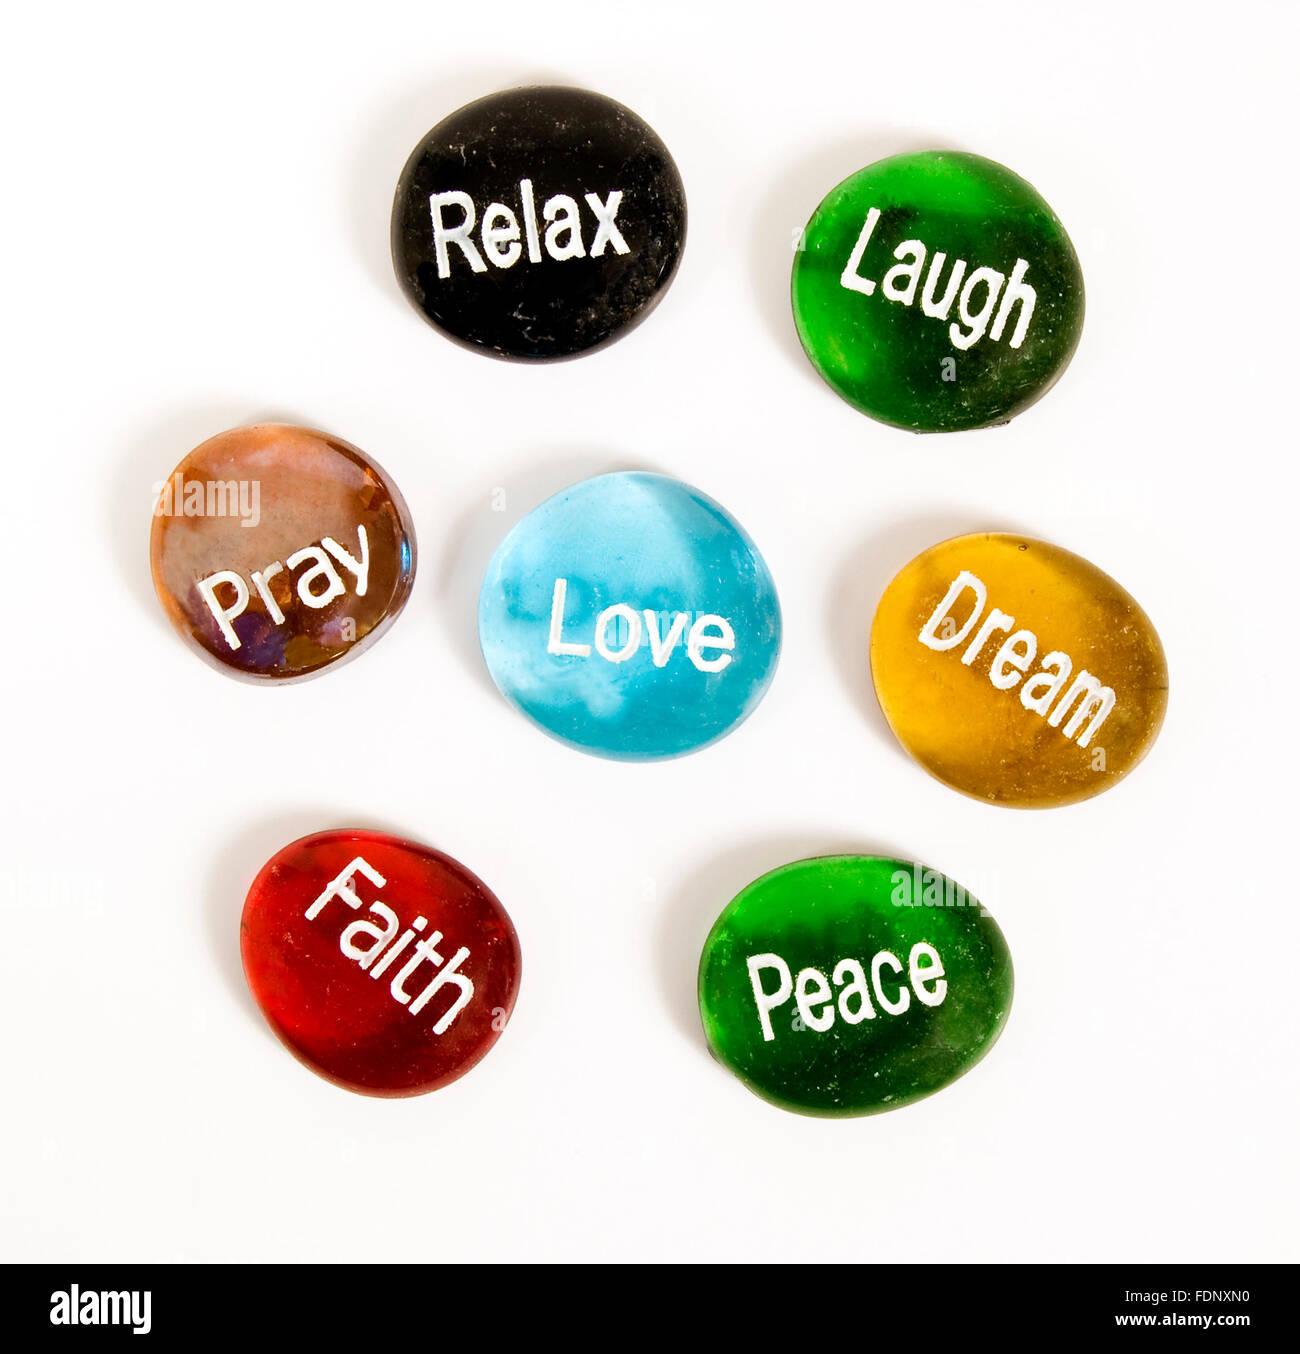 Seven Encouragement Stones on White - Stock Image